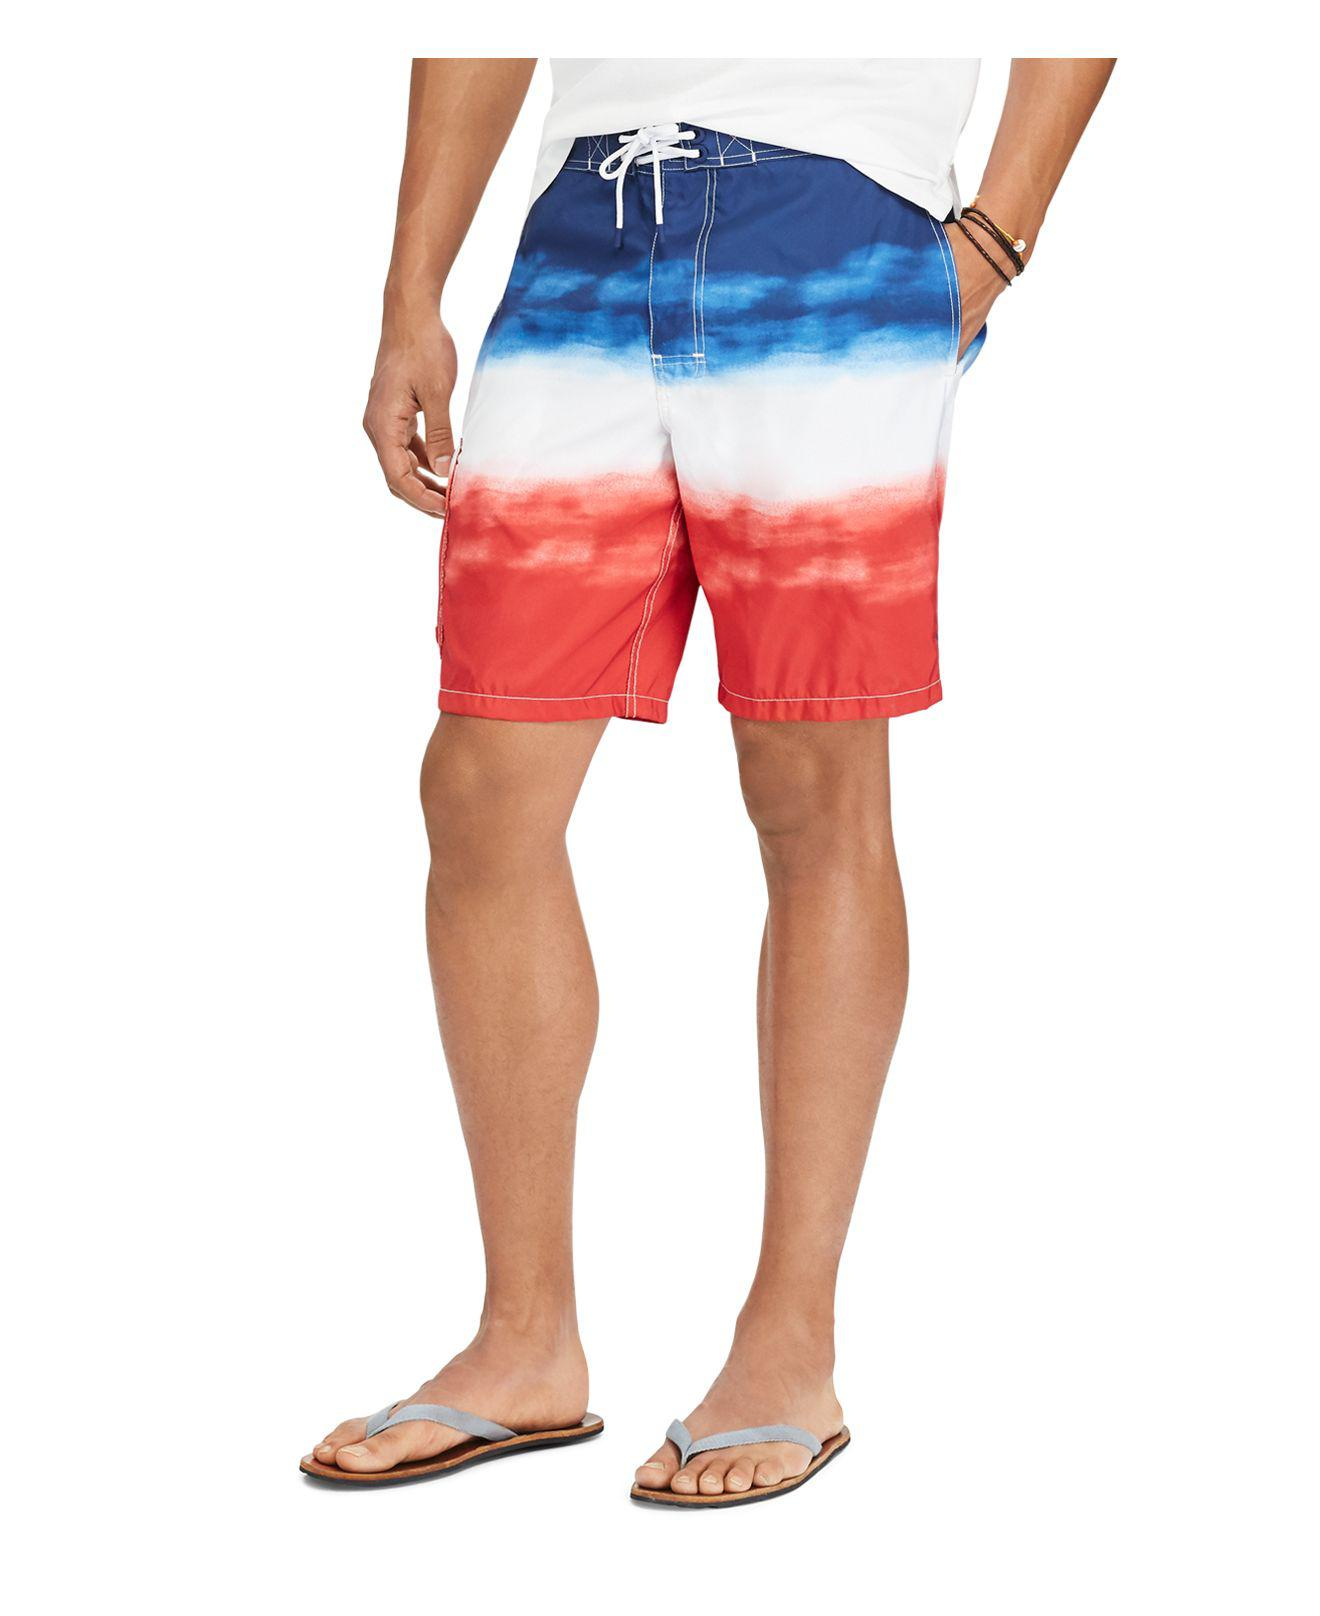 fc375a57bb6e9 Polo Ralph Lauren Kailua Dip-dye Board Shorts in Red for Men - Lyst